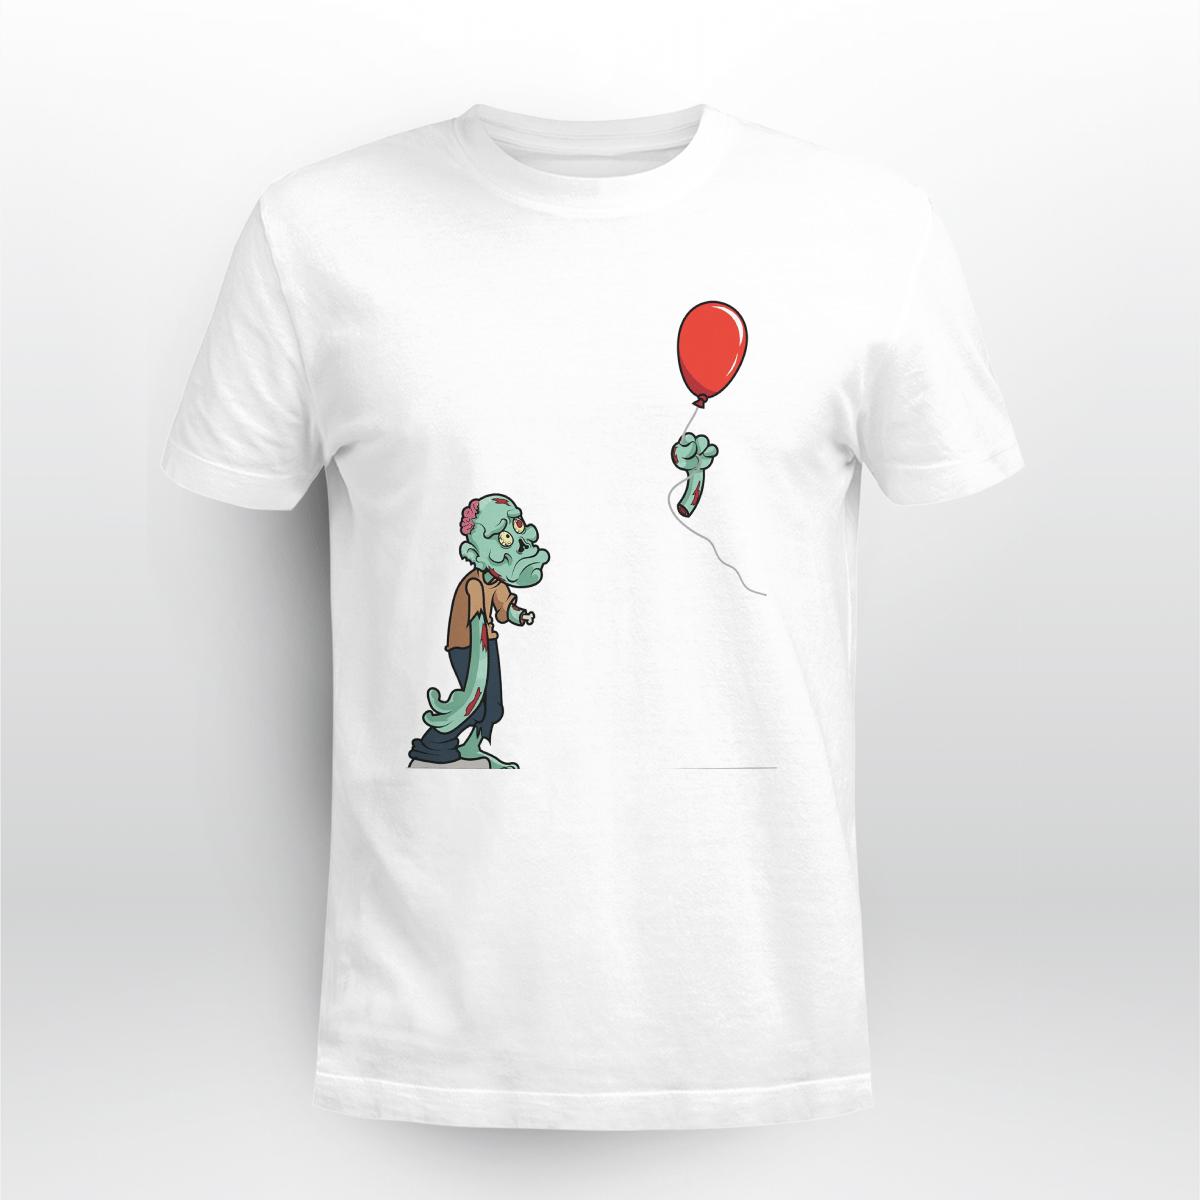 Halloween Zombie Cut Off Arm Balloon Shirt